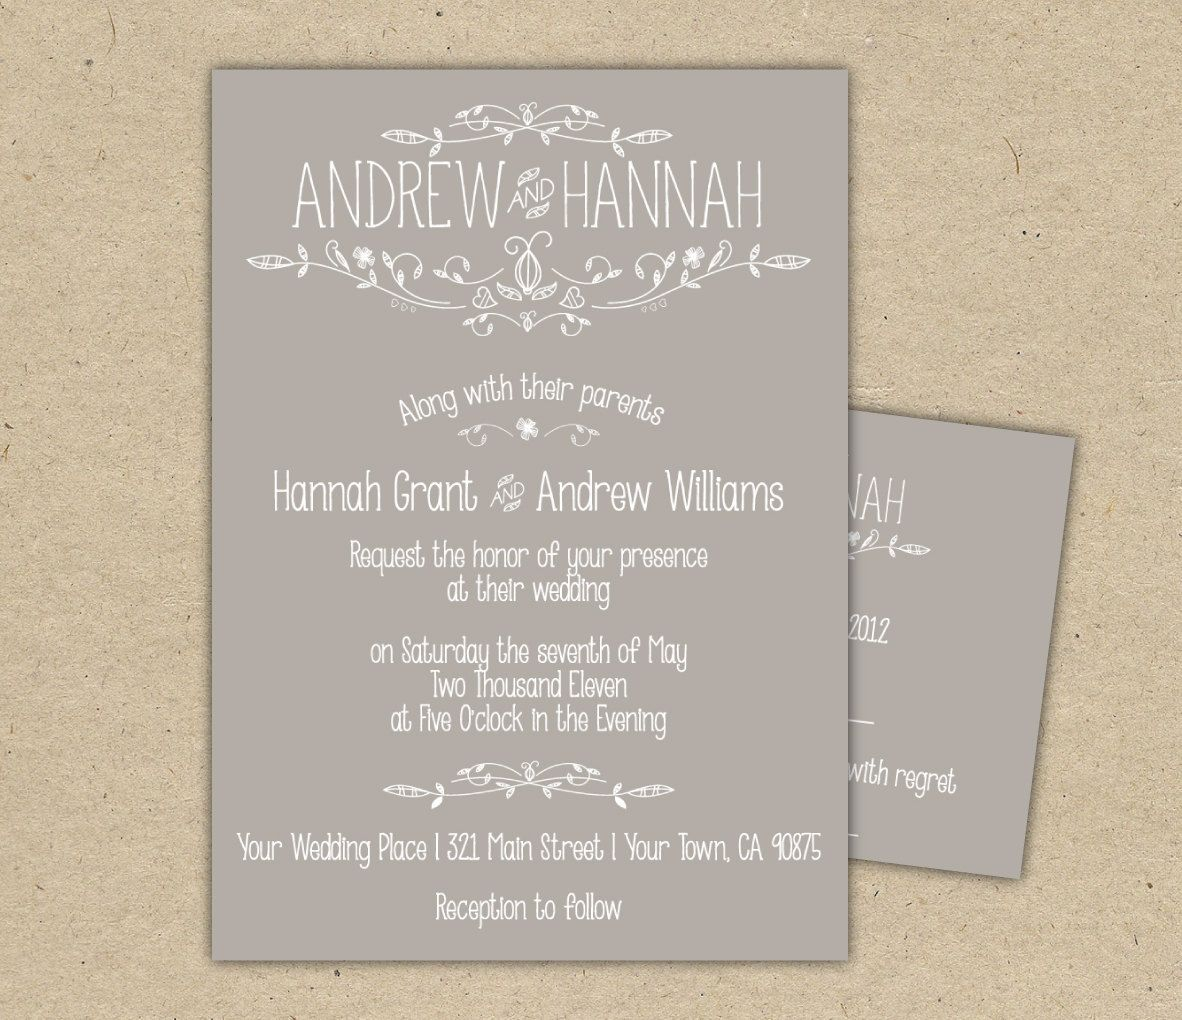 Make Your Own Electronic Wedding Invitations Printable